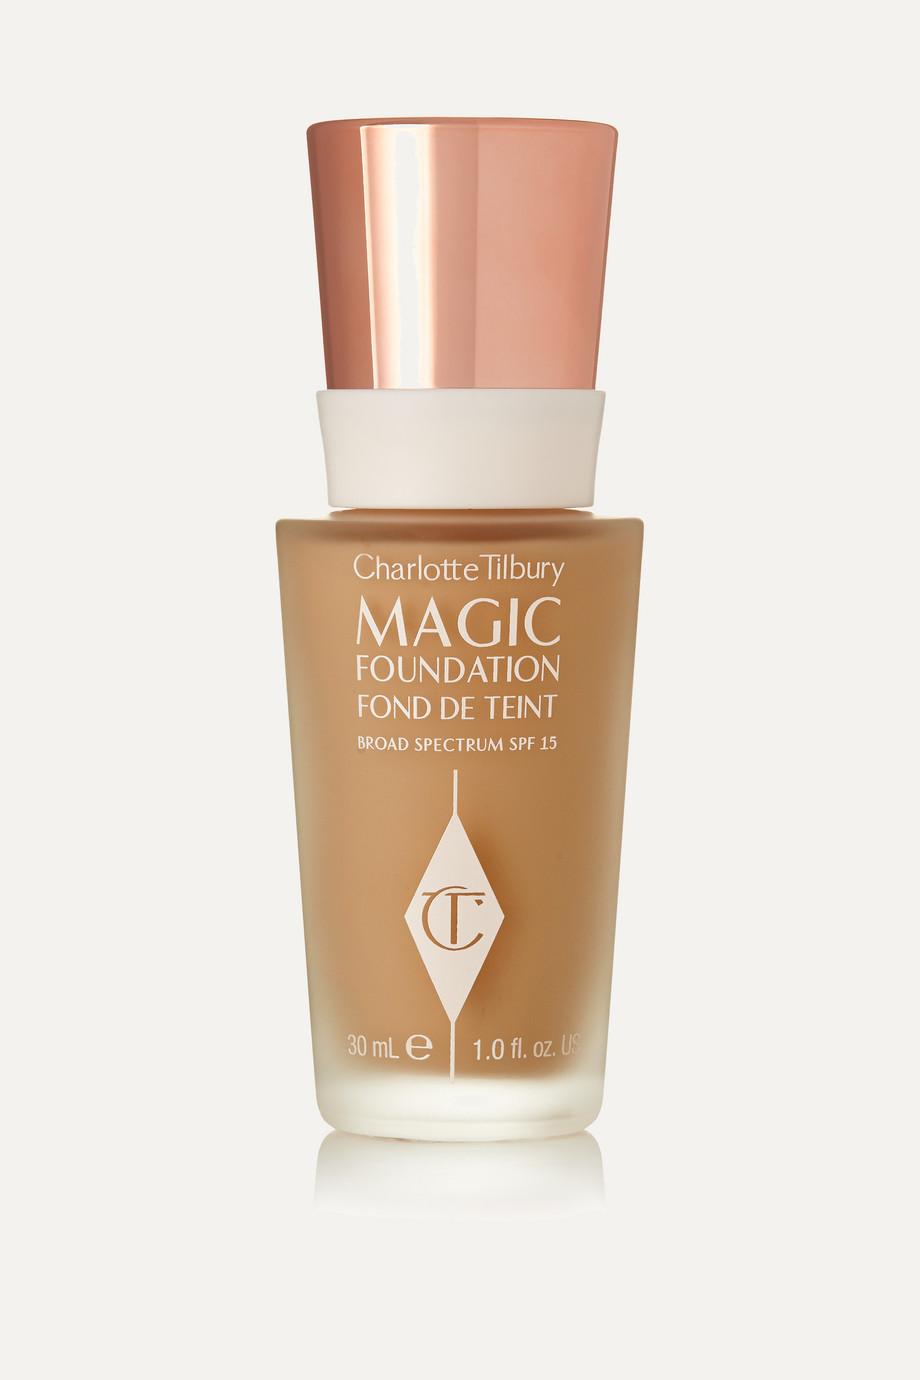 Charlotte Tilbury Magic Foundation Flawless Long-Lasting Coverage SPF15 - Shade 7, 30ml